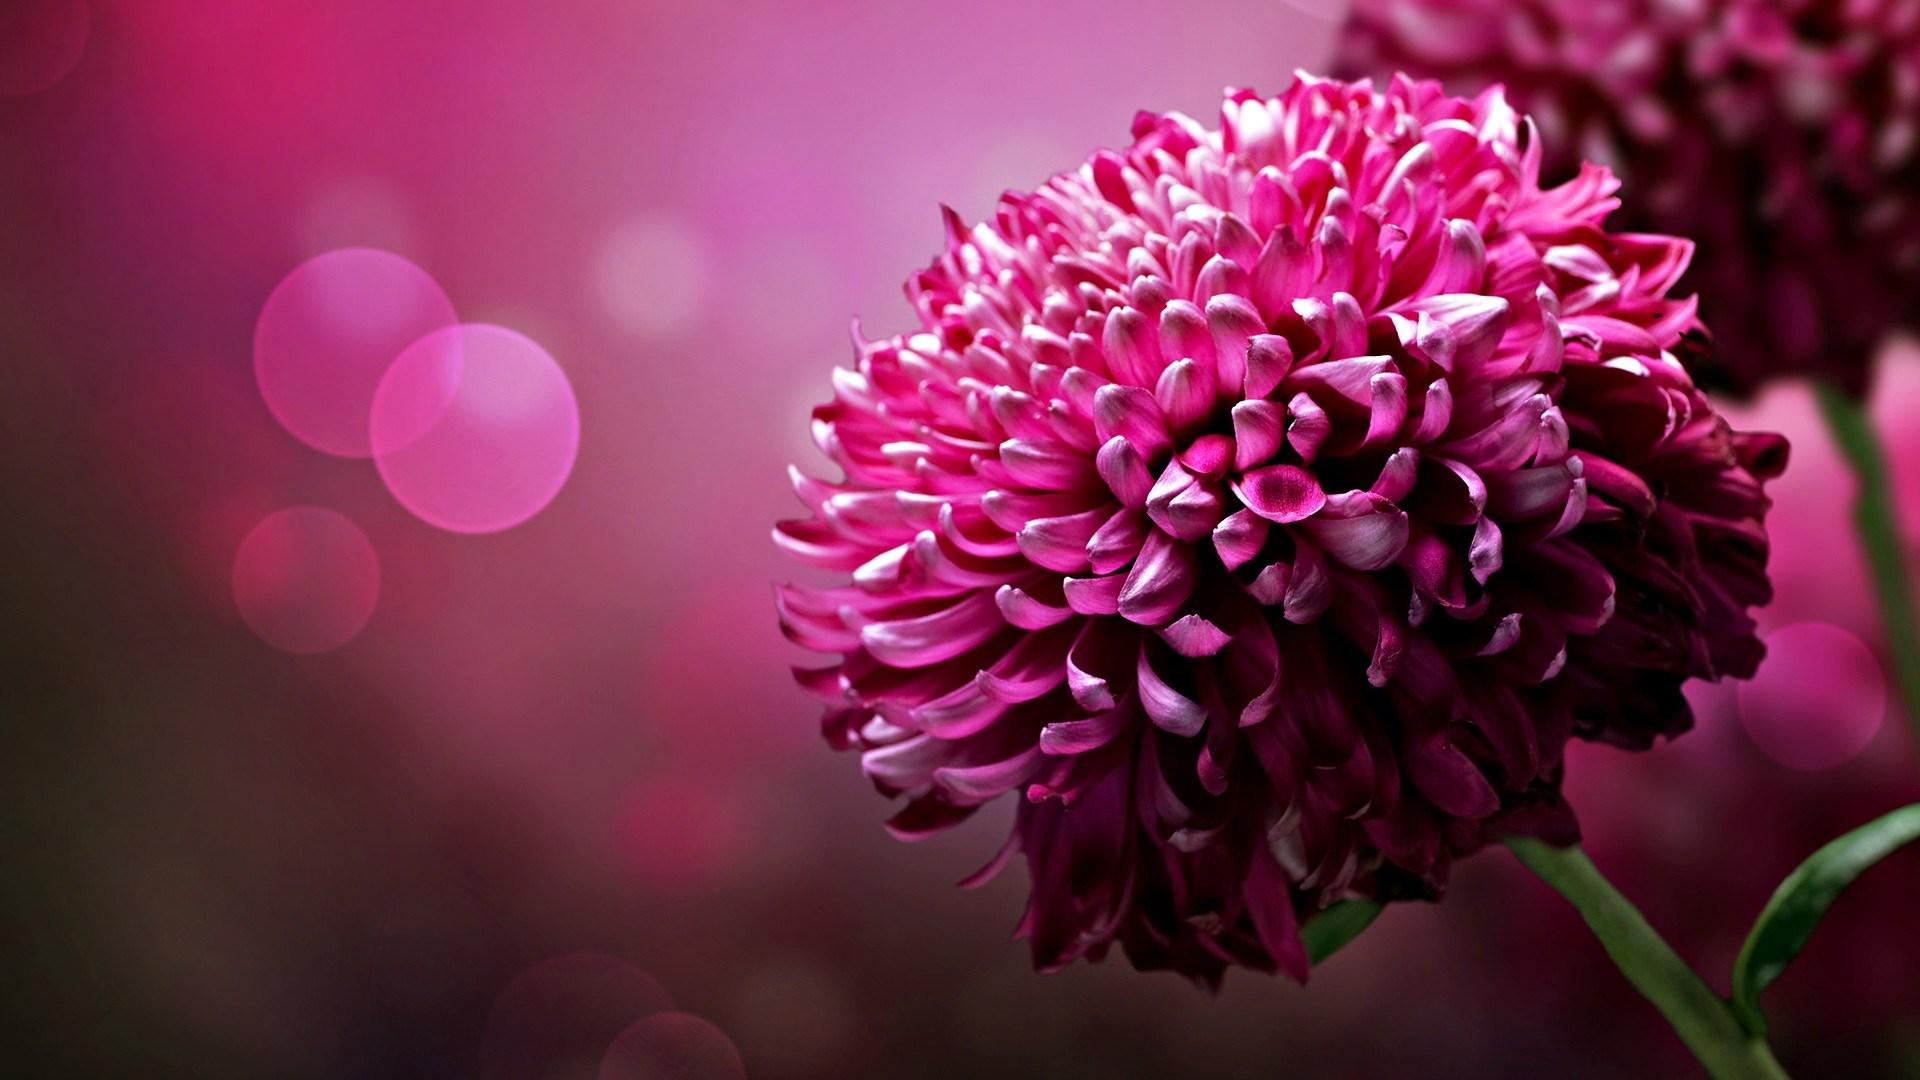 desktop-full-screen-floral-hd-1920x1080-wallpaper-wp3804485